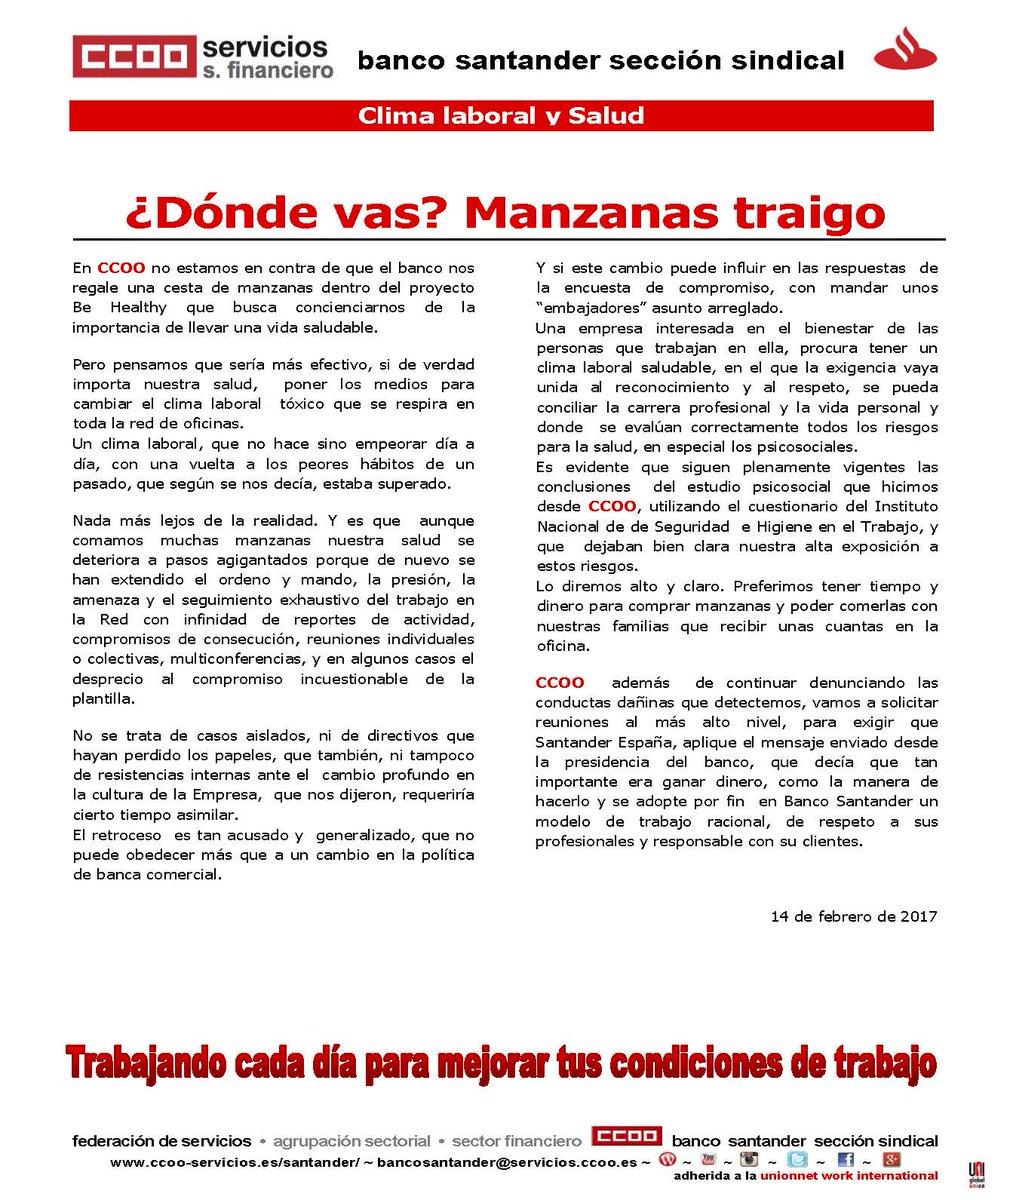 CCOO Banco Santander on Twitter: \